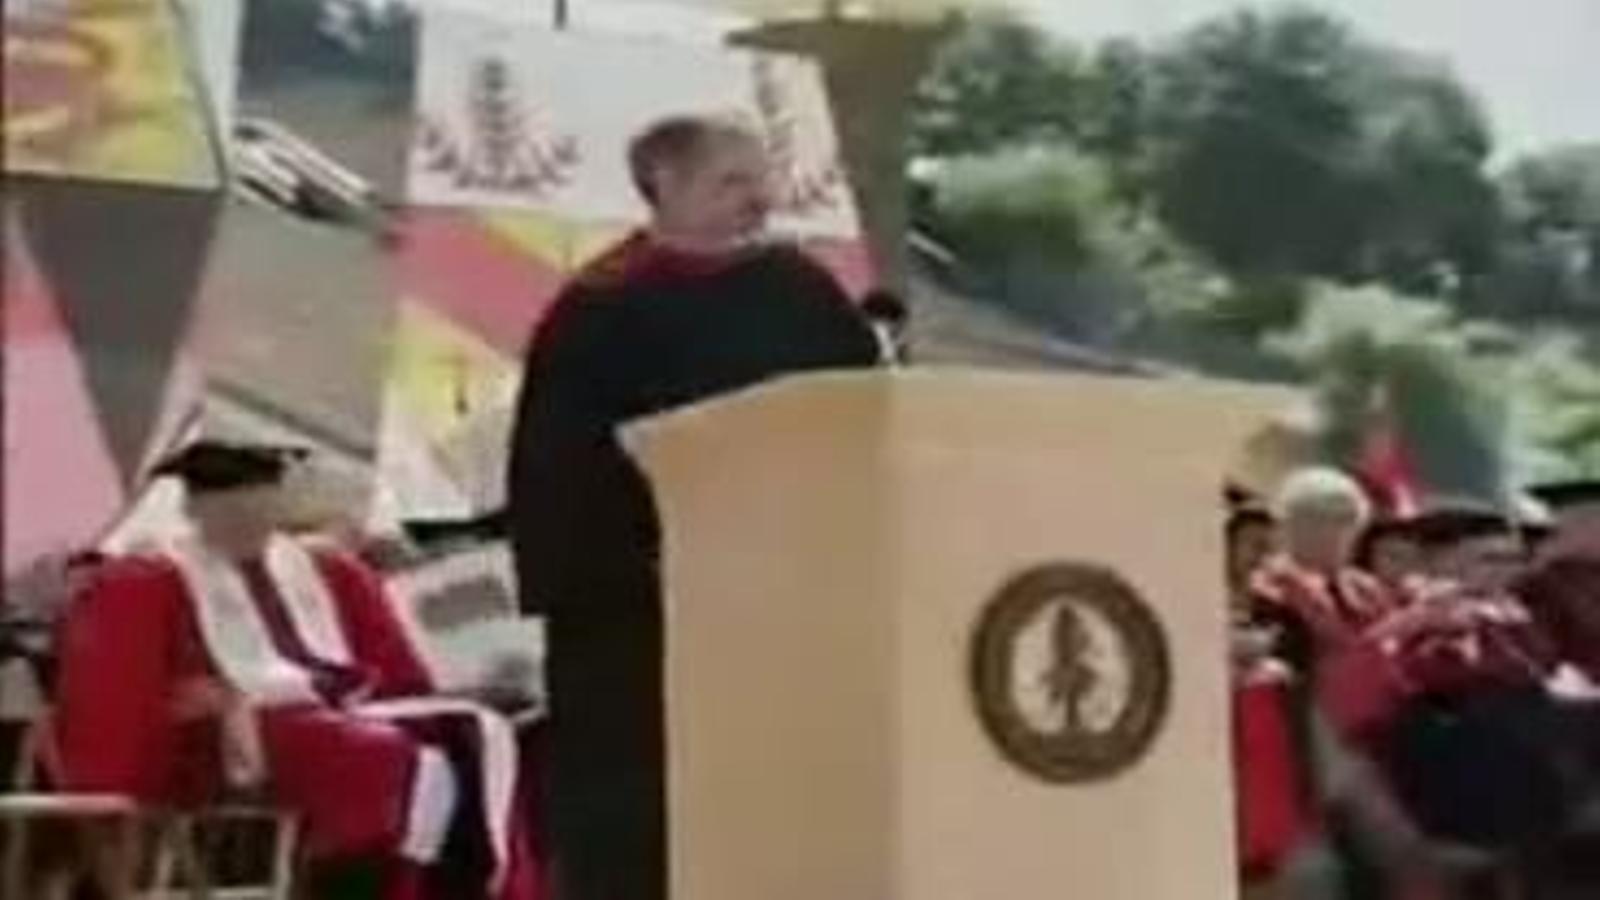 Discurs de Steve Jobs a la Universitat de Stanford (2005)